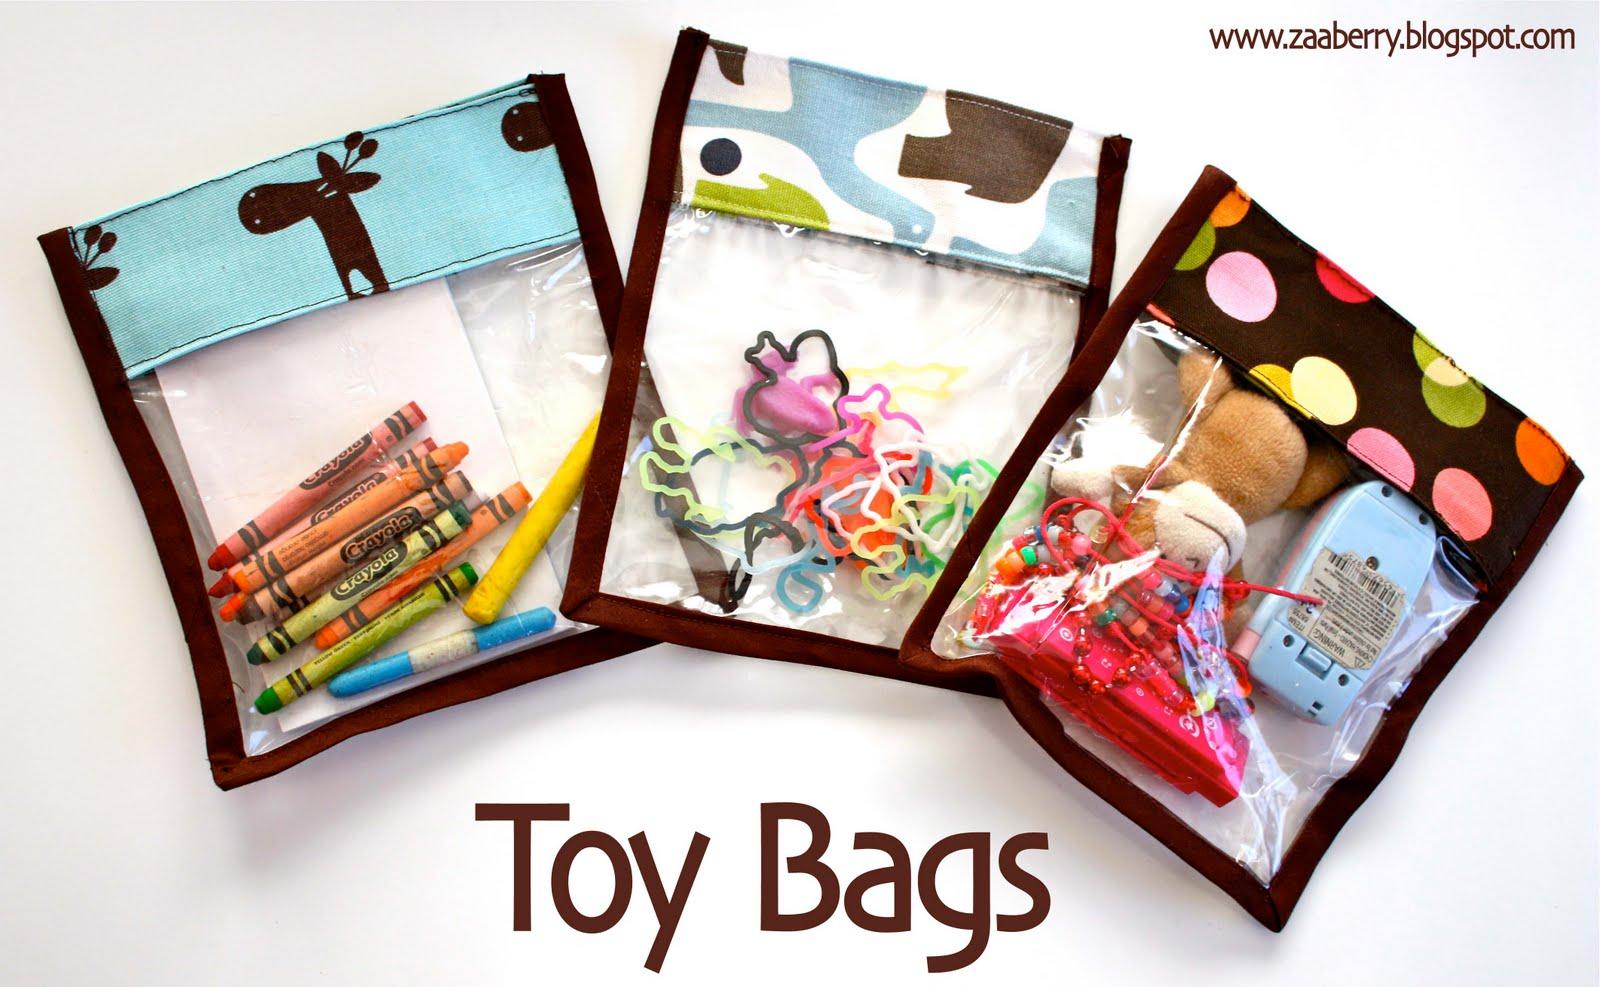 http://3.bp.blogspot.com/_tiLQjhXAq-8/TTDxax29tOI/AAAAAAAAAvc/0VrhRMGQHHs/s1600/toy%20bag.jpg